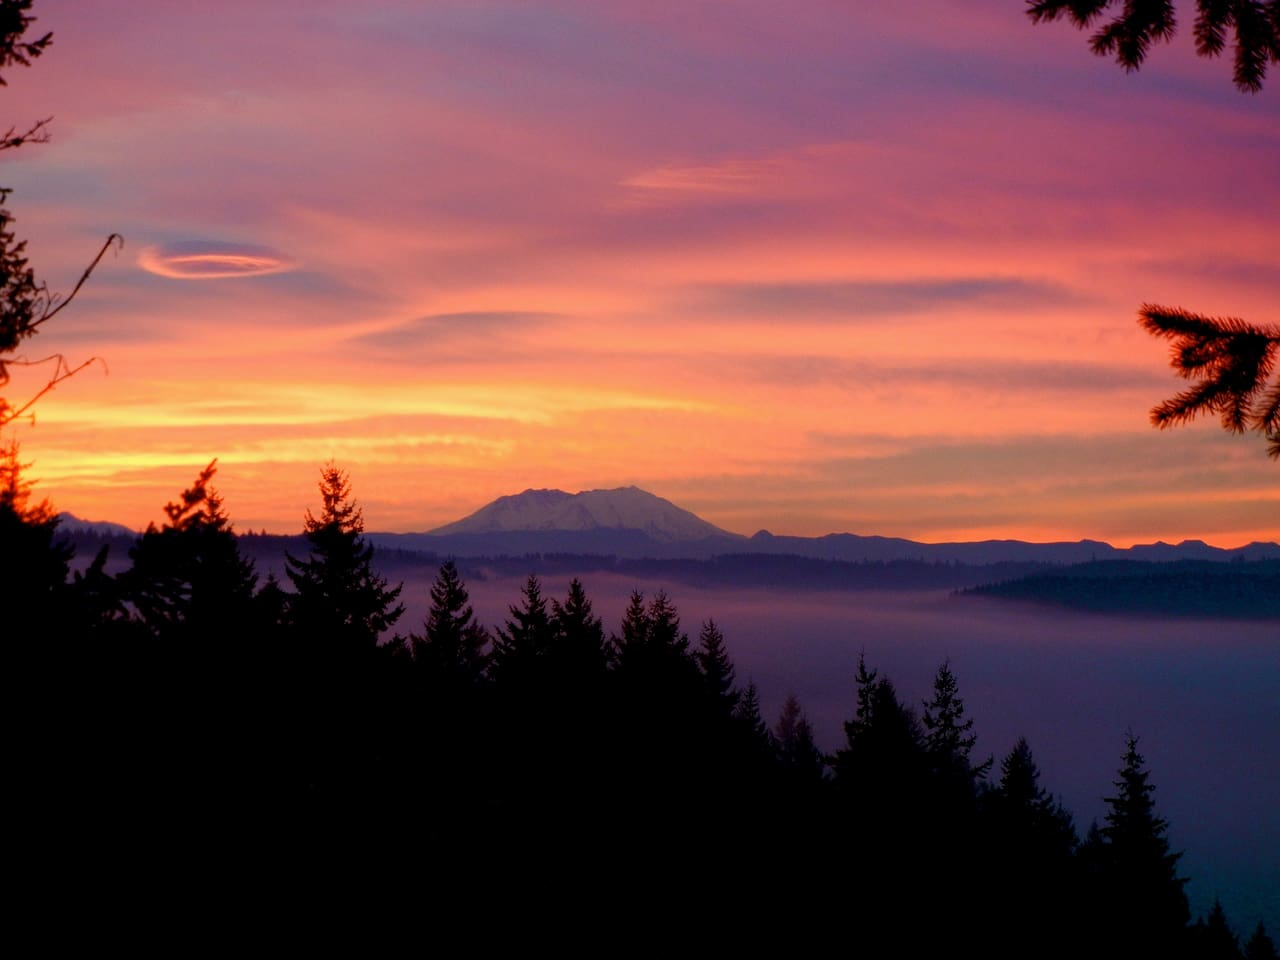 The sunrises